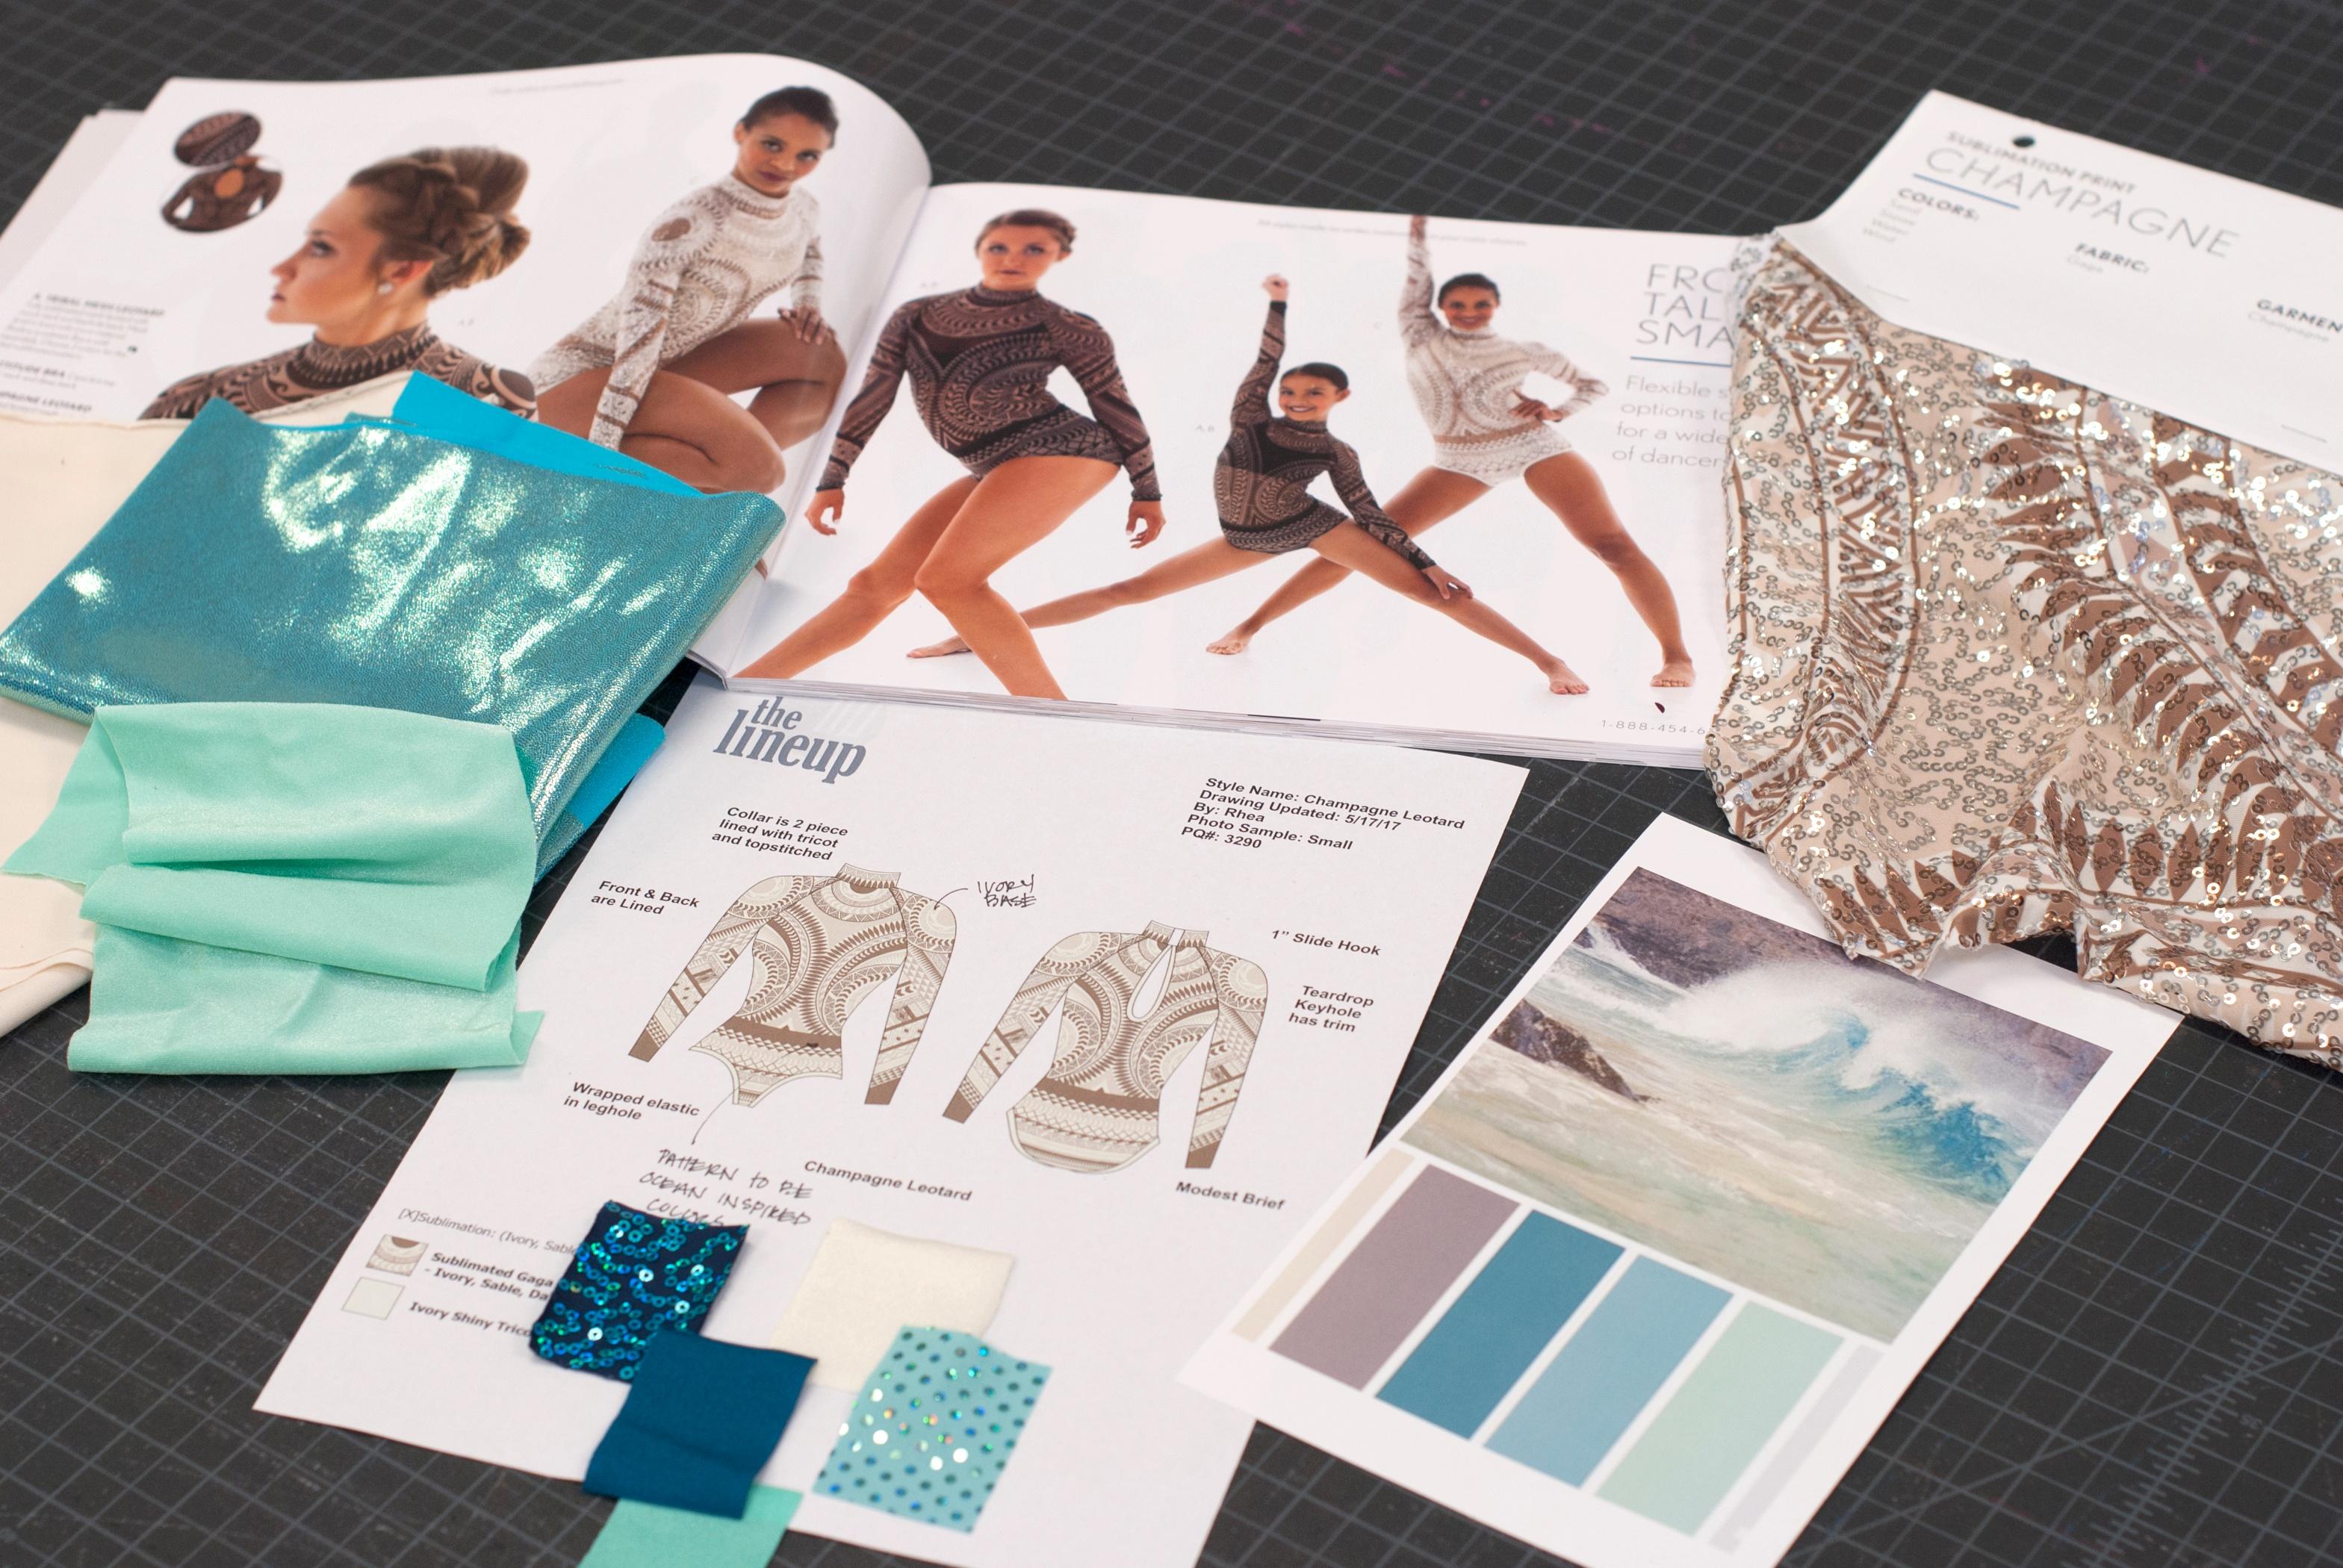 design inspiration for dance costumes